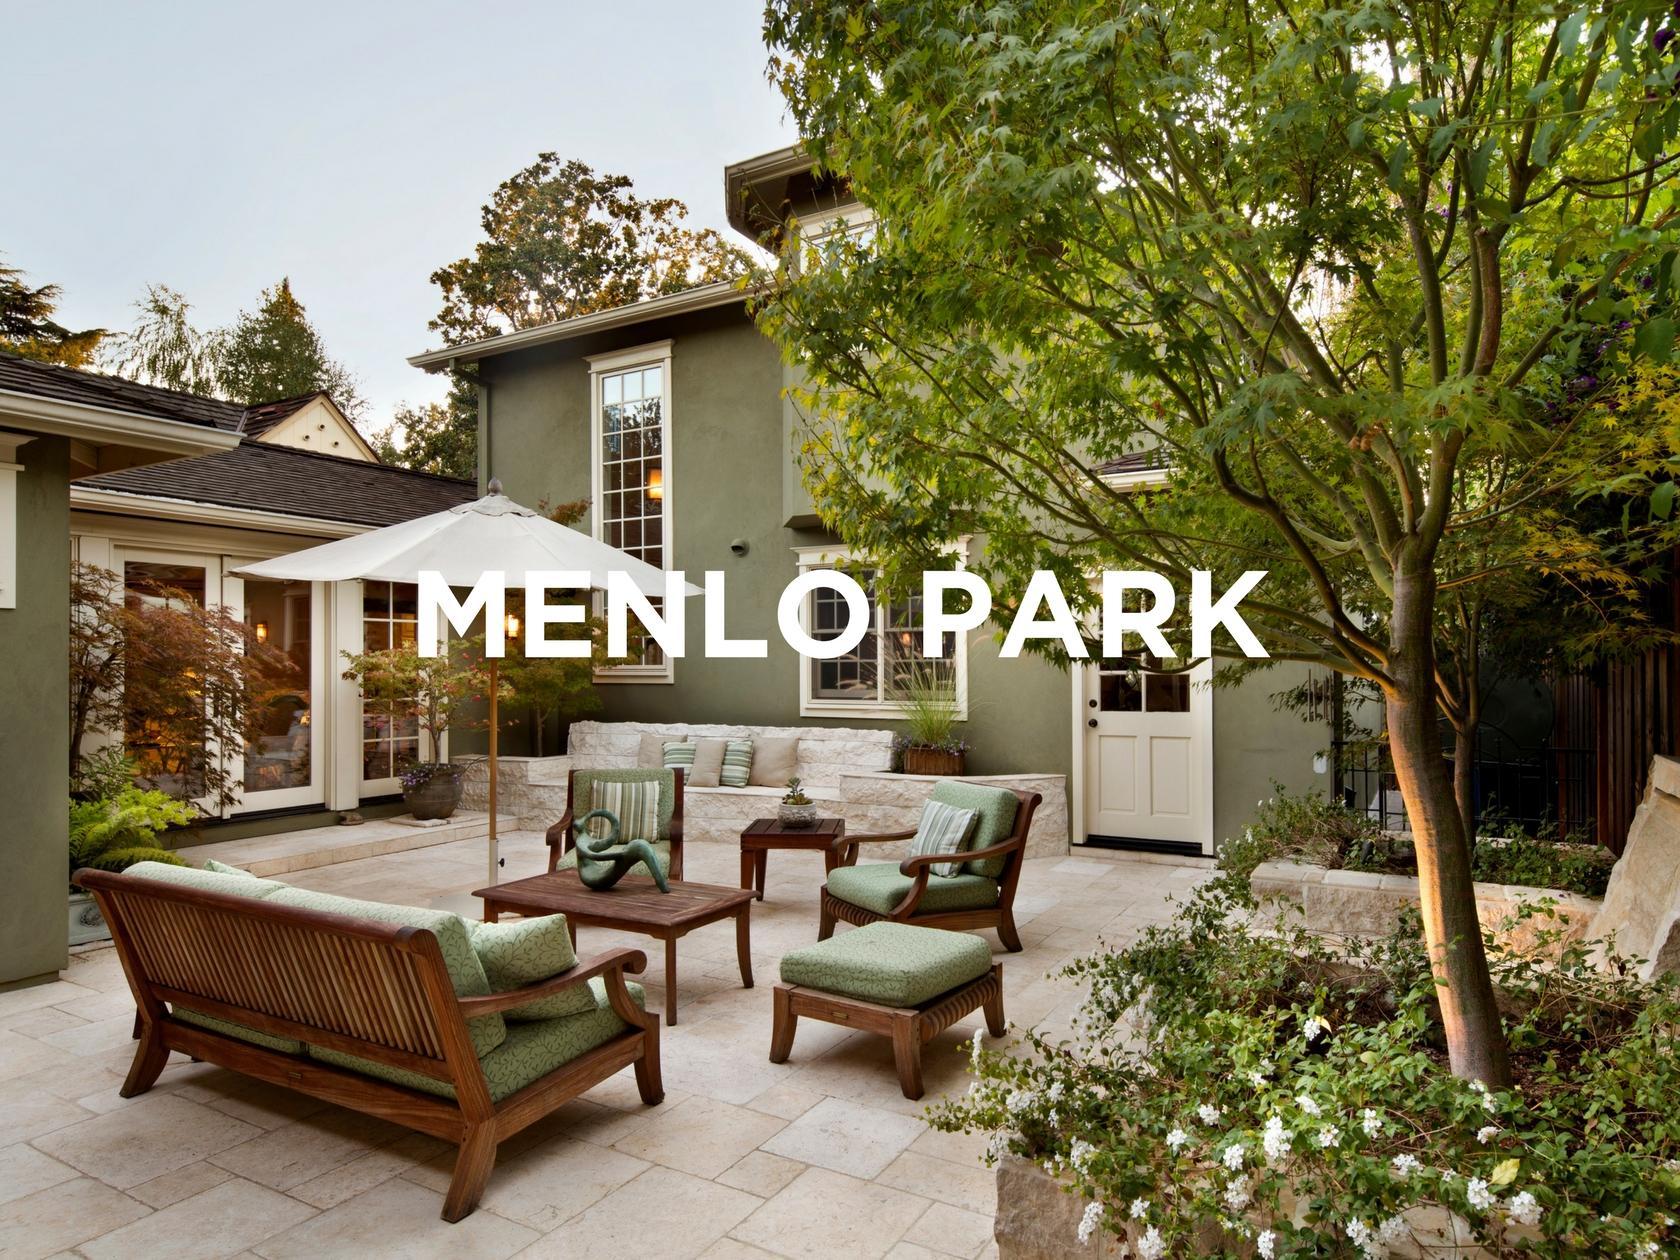 menlo park charlene cogan real estate